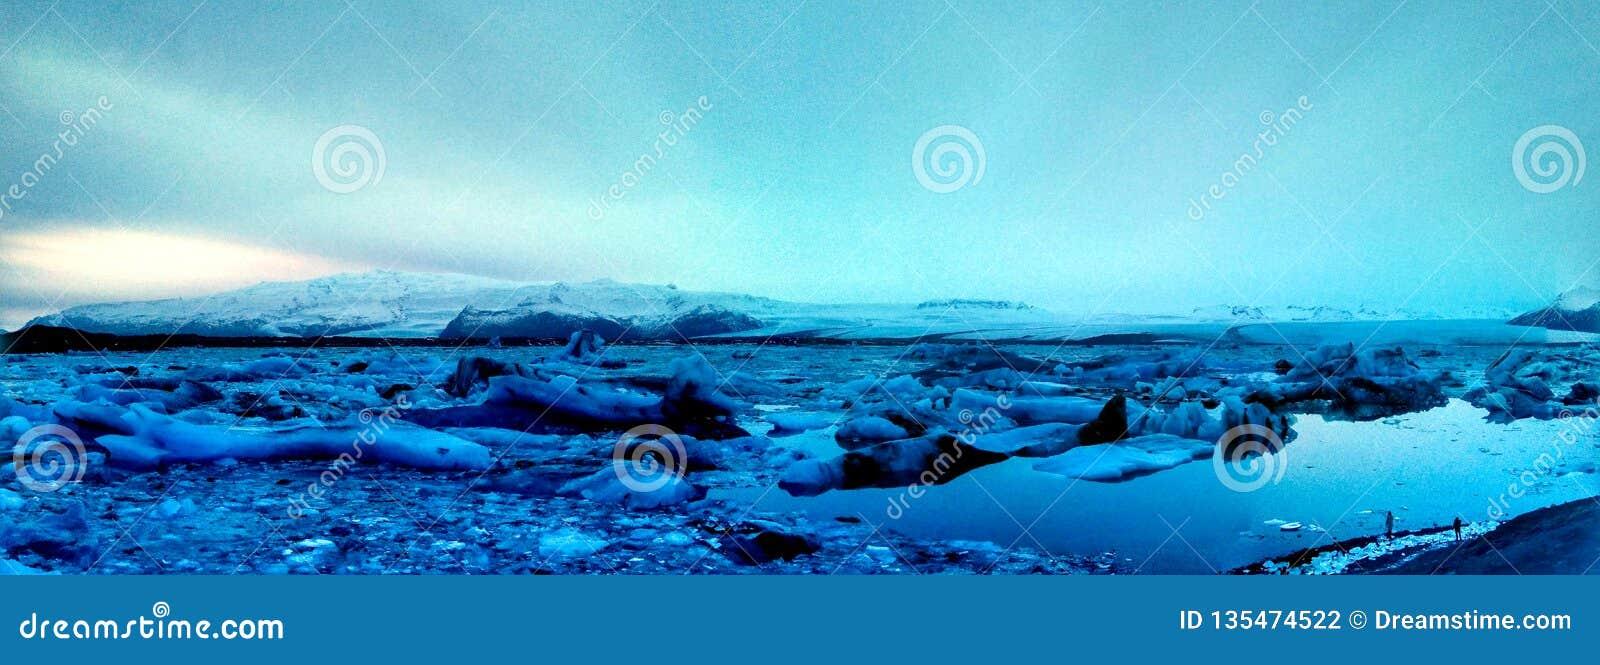 Viajeros del iceberg